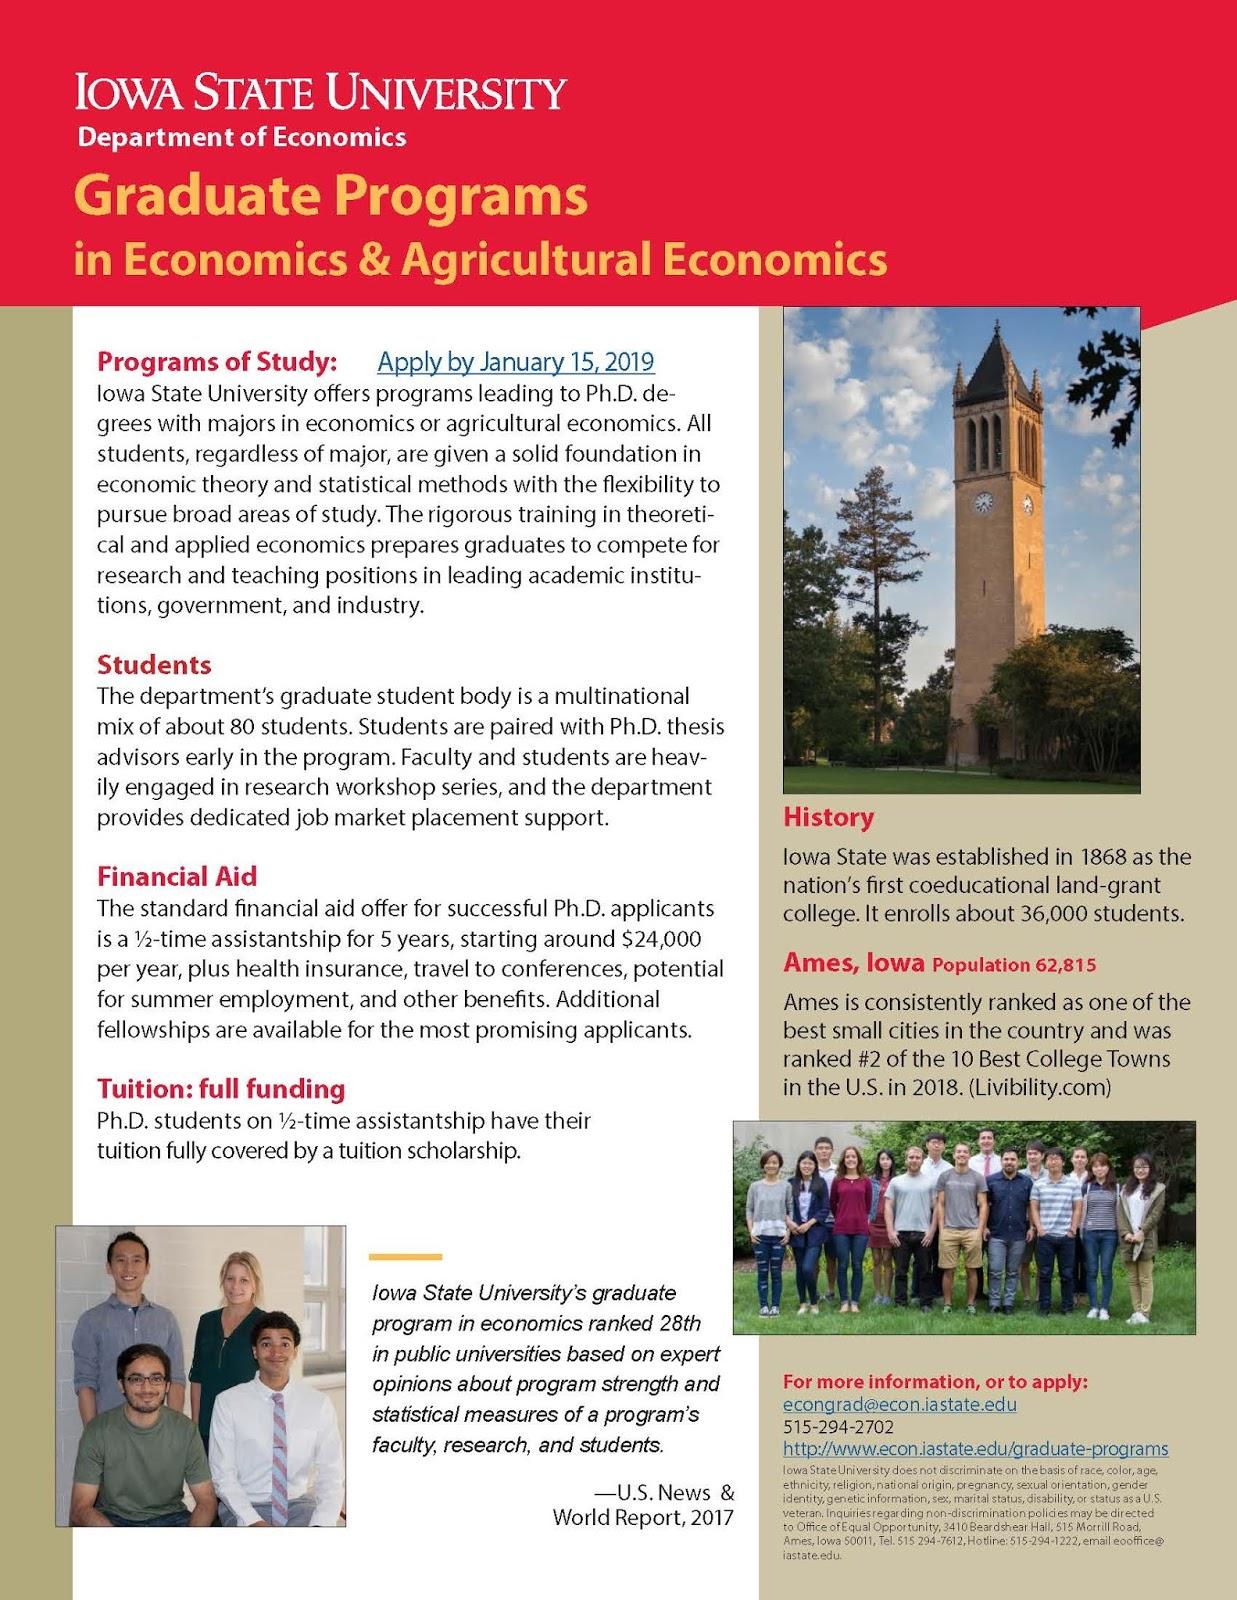 ECON Undergraduate Blog: Economics and Ag Economics PhD programs at